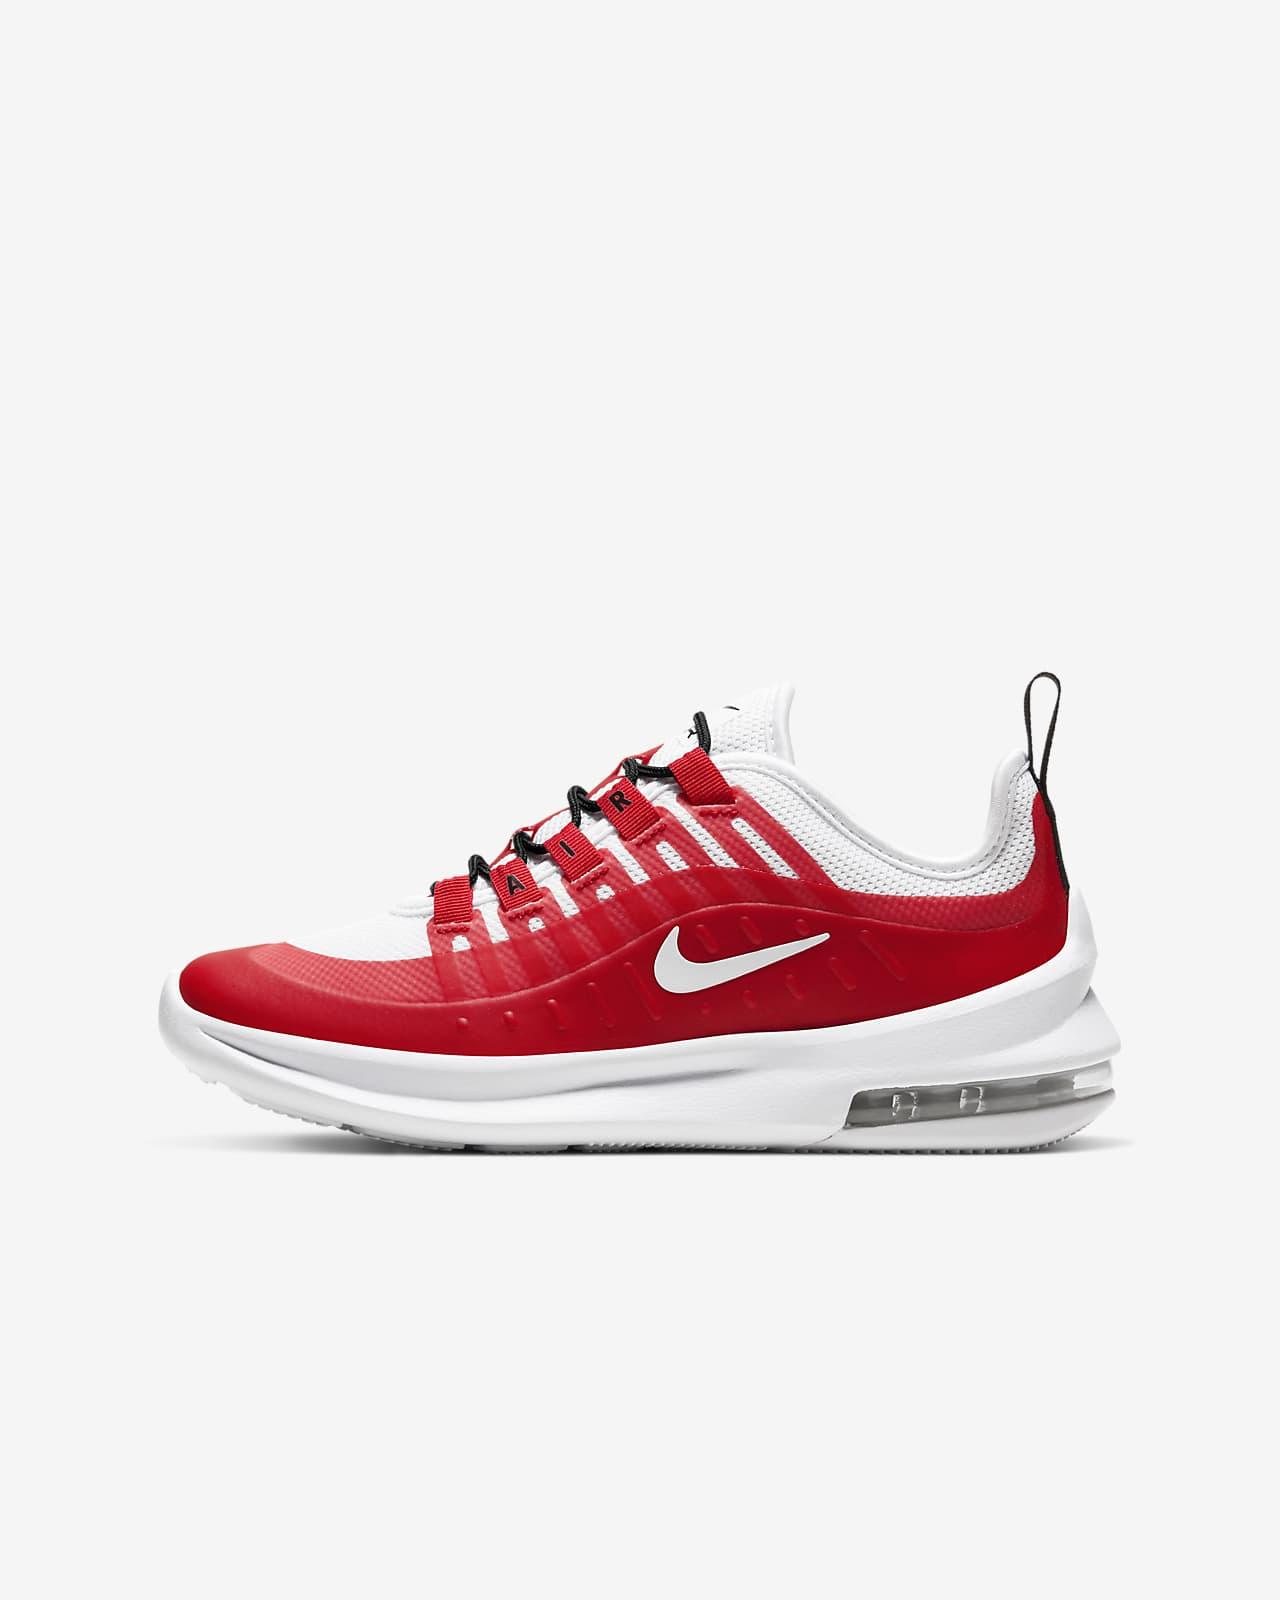 chaussures nike air max 97et 270